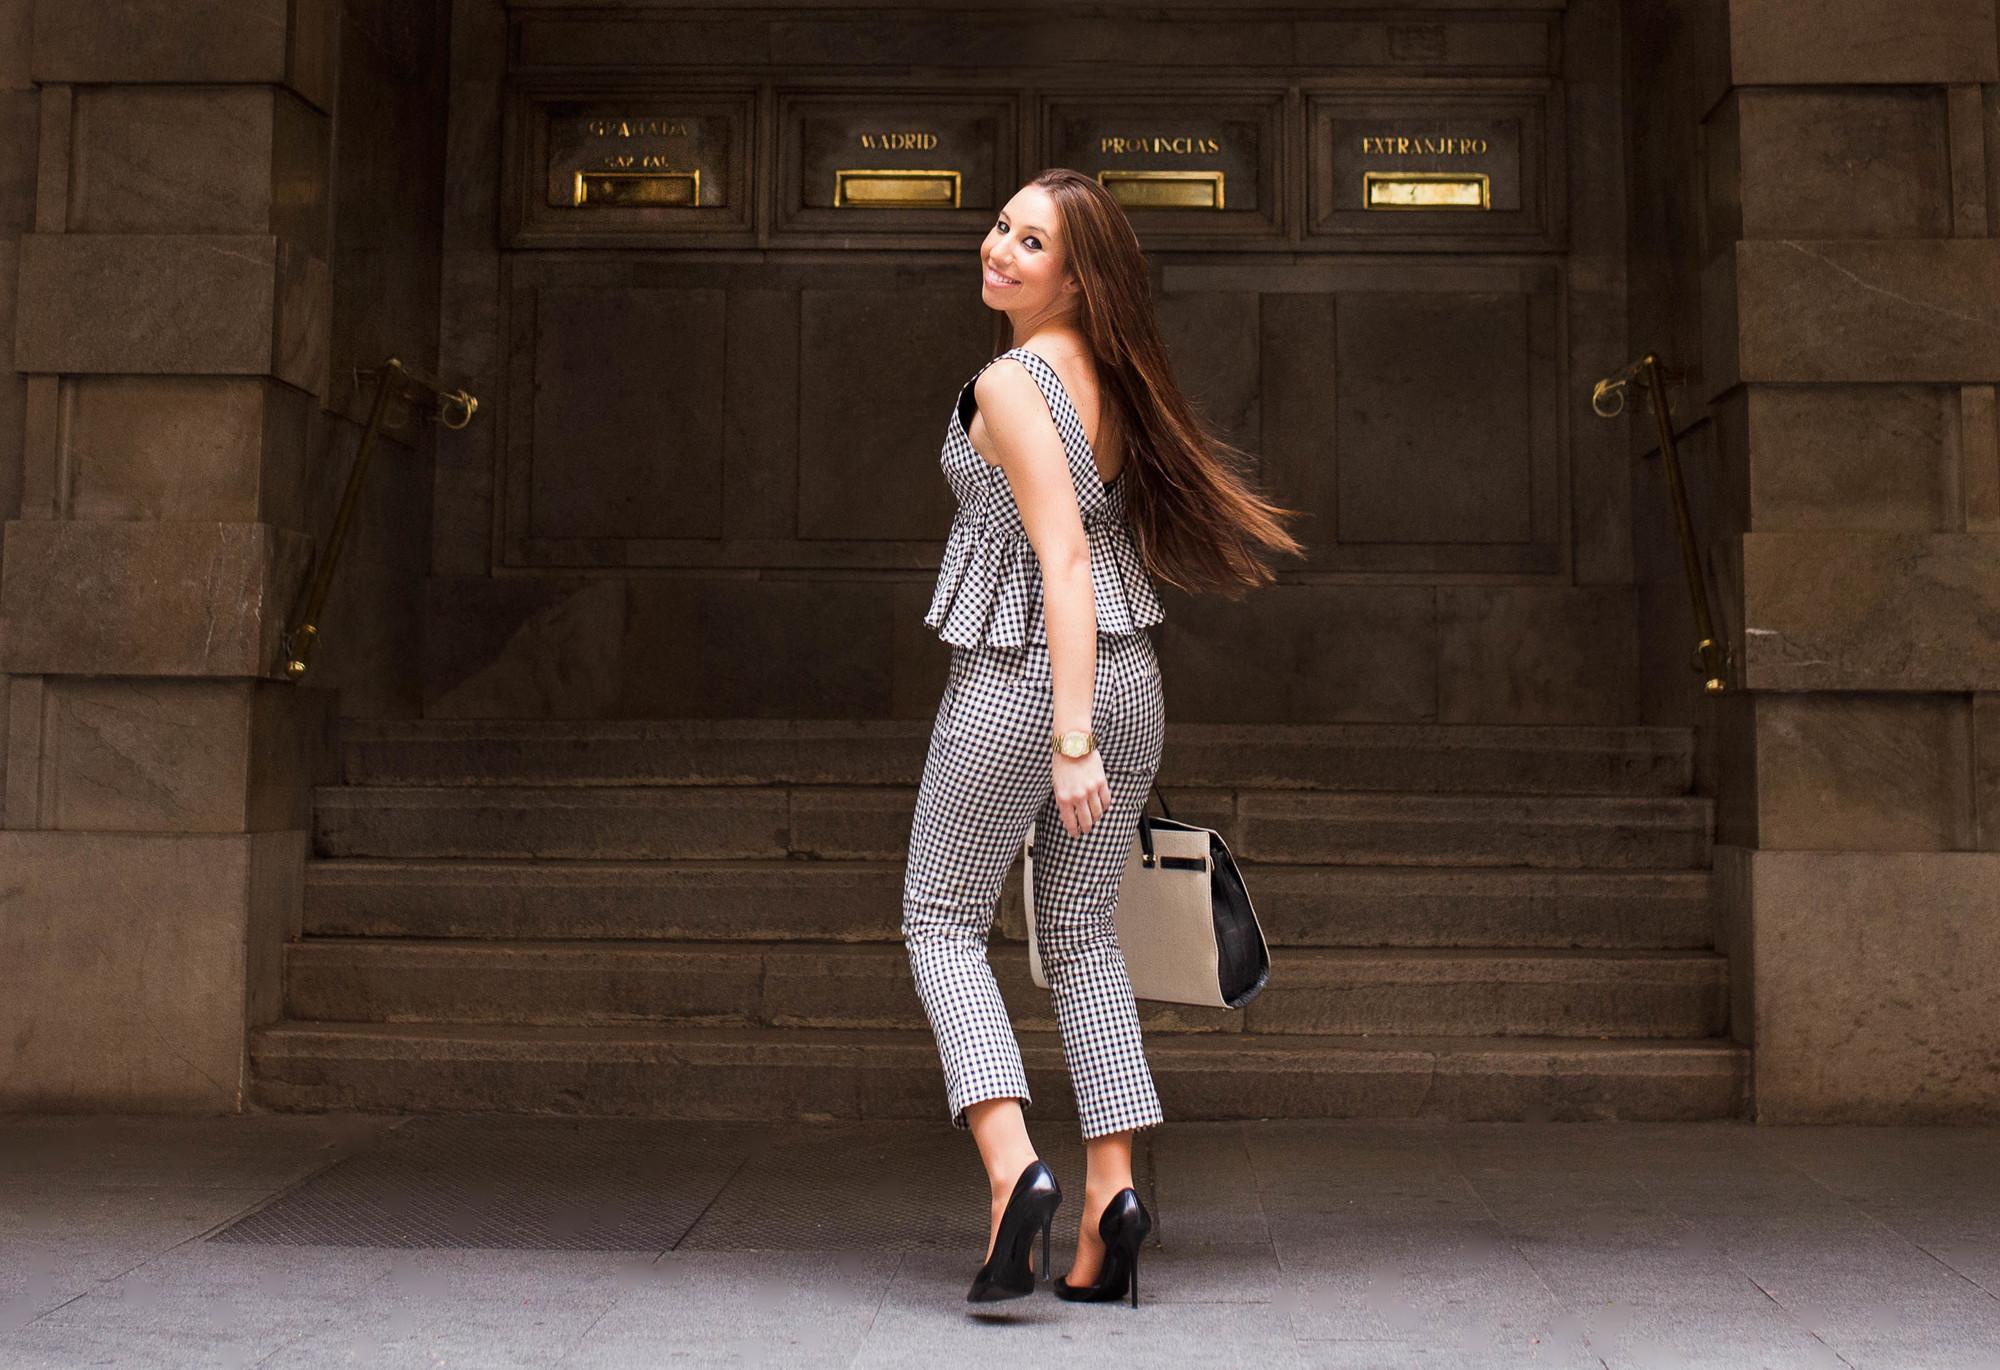 fotografos moda Granada fotografos moda granada-9